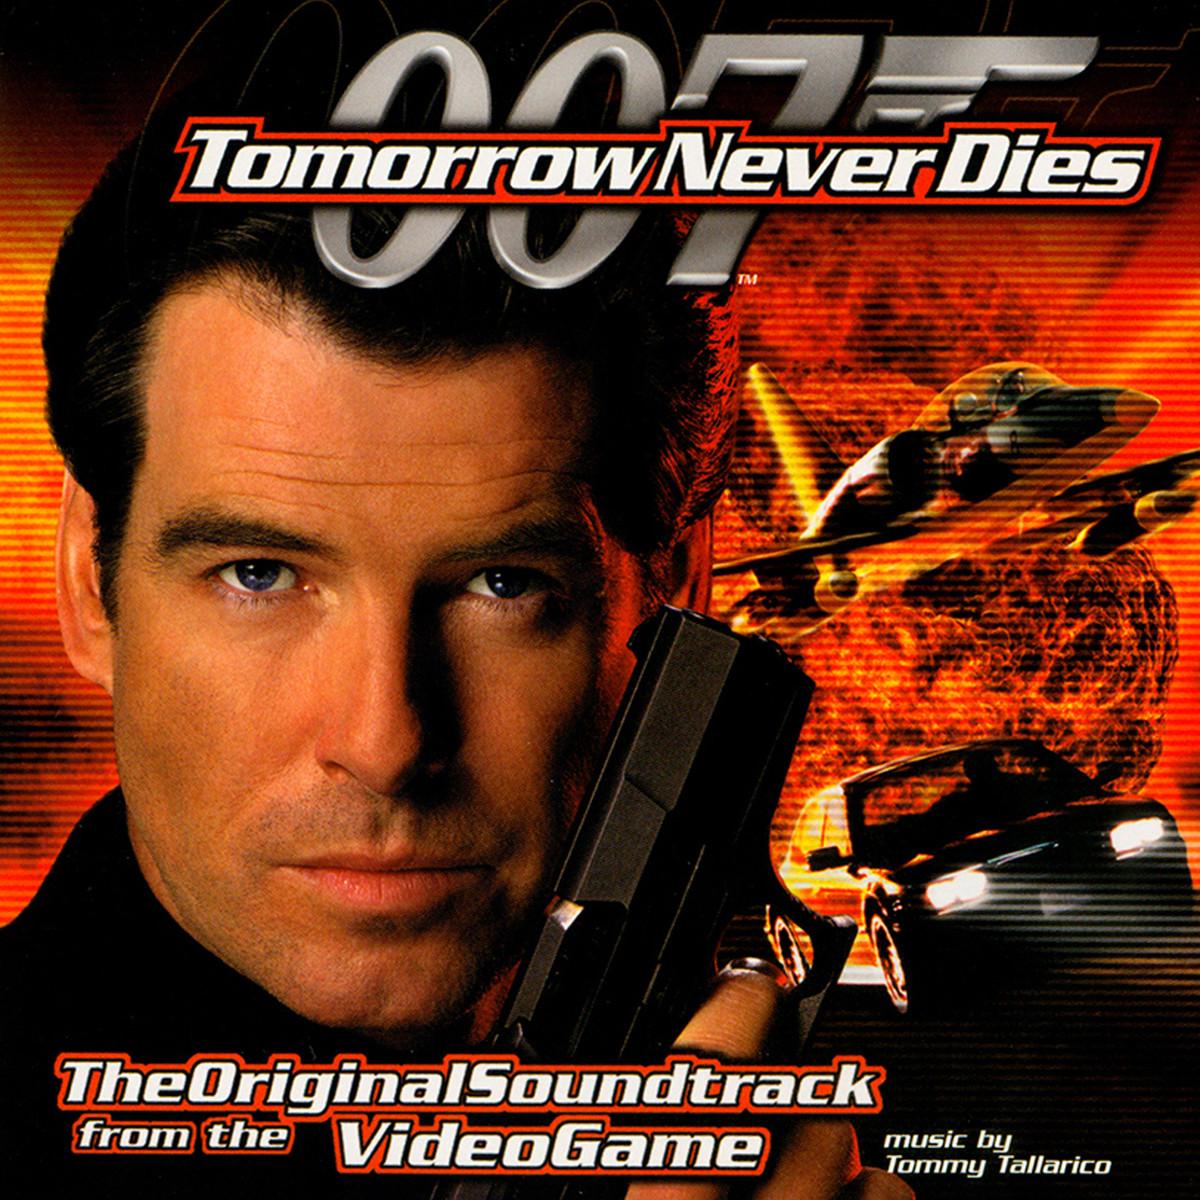 tomorrow never dies video game original soundtrack